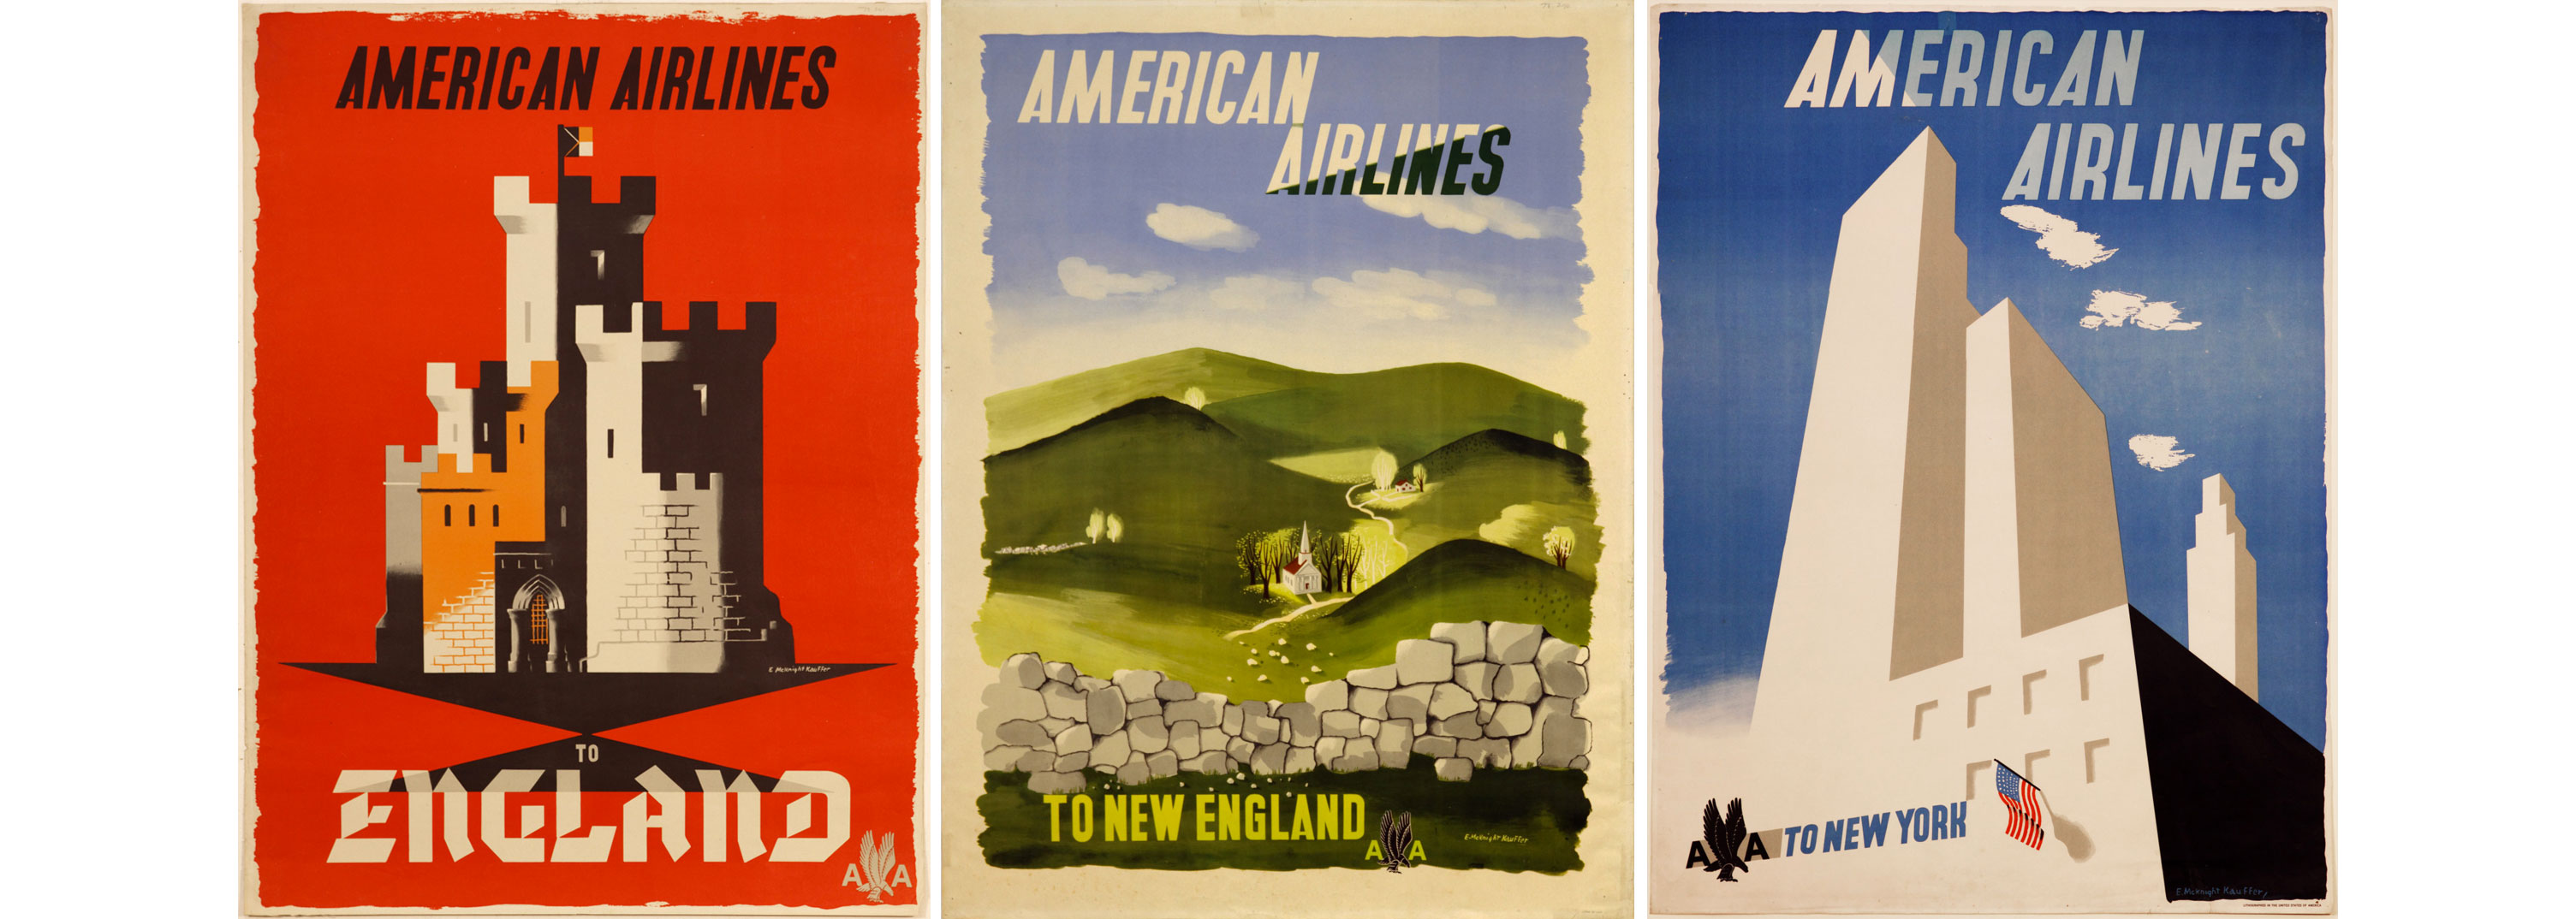 Edward-McKnight-Kauffer-US-affiches-american-airlines-01-